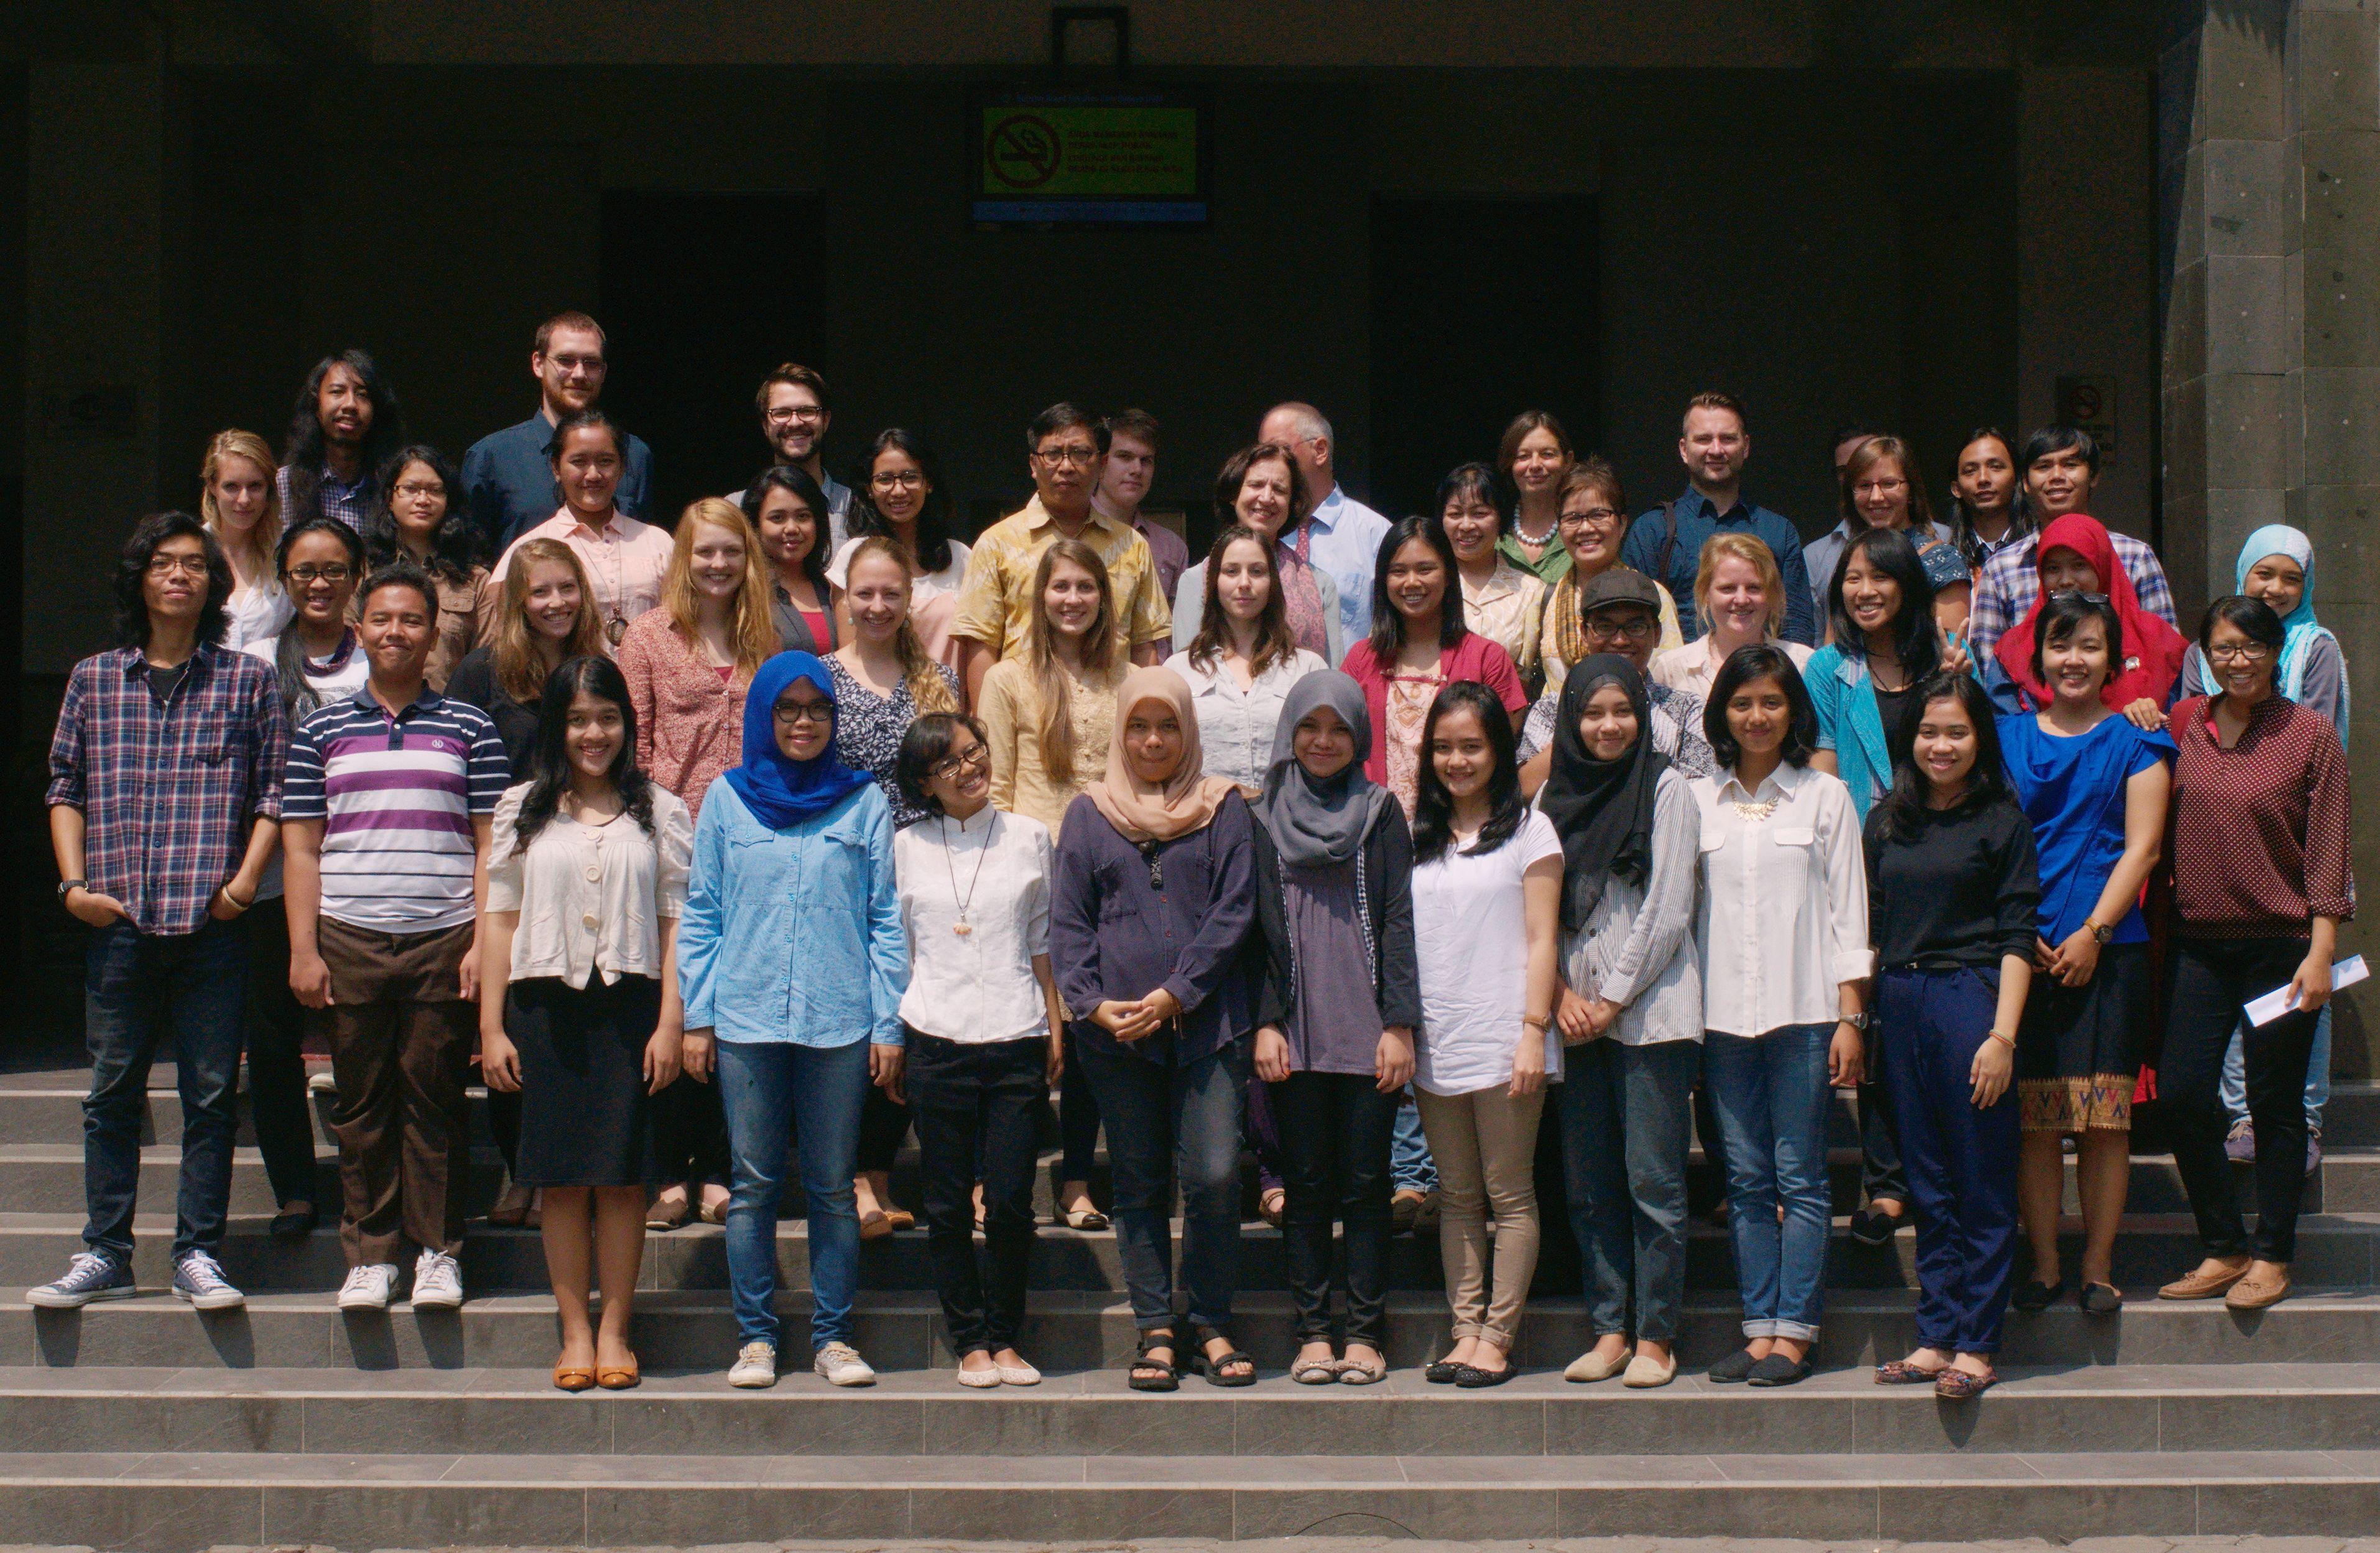 Gruppenbild Yogyakarta 2014